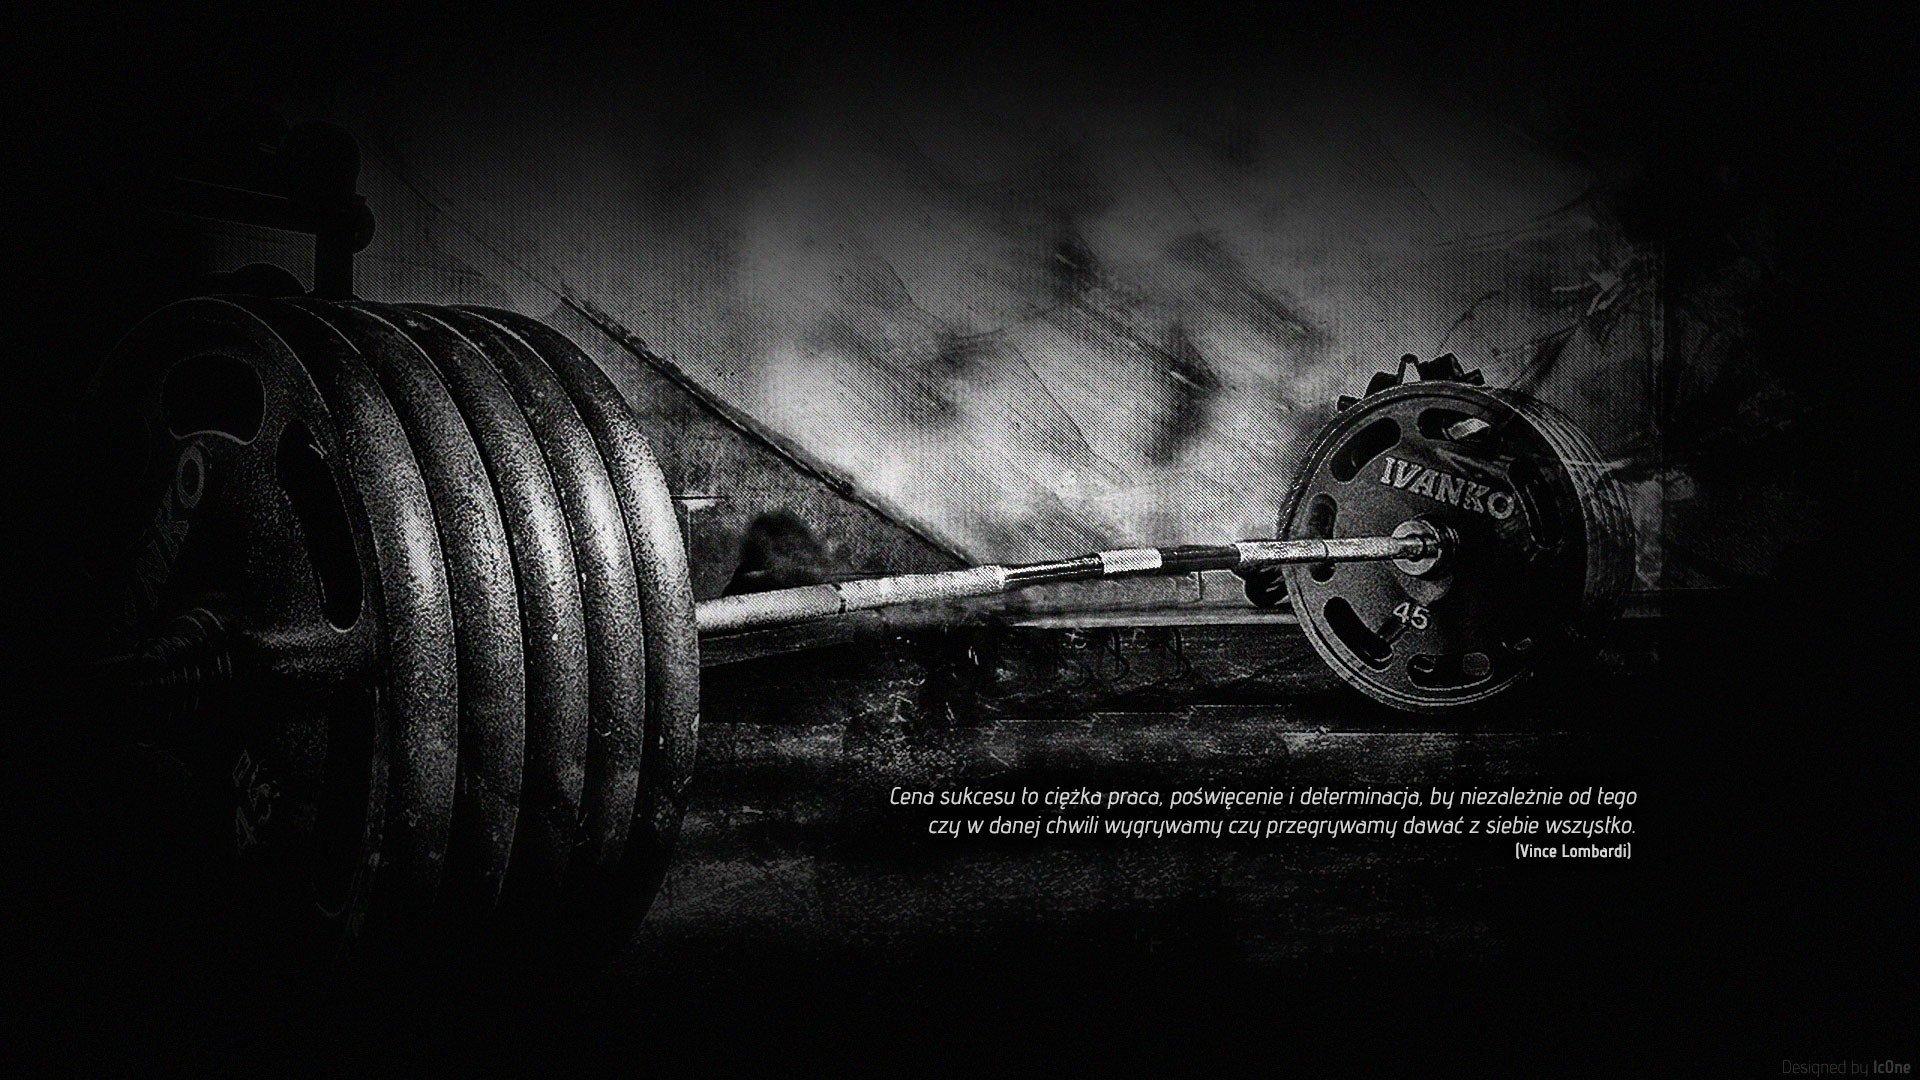 gym fitness motivation tapeta lc0ne siAOaeuownia wallpaper background 1920x1080